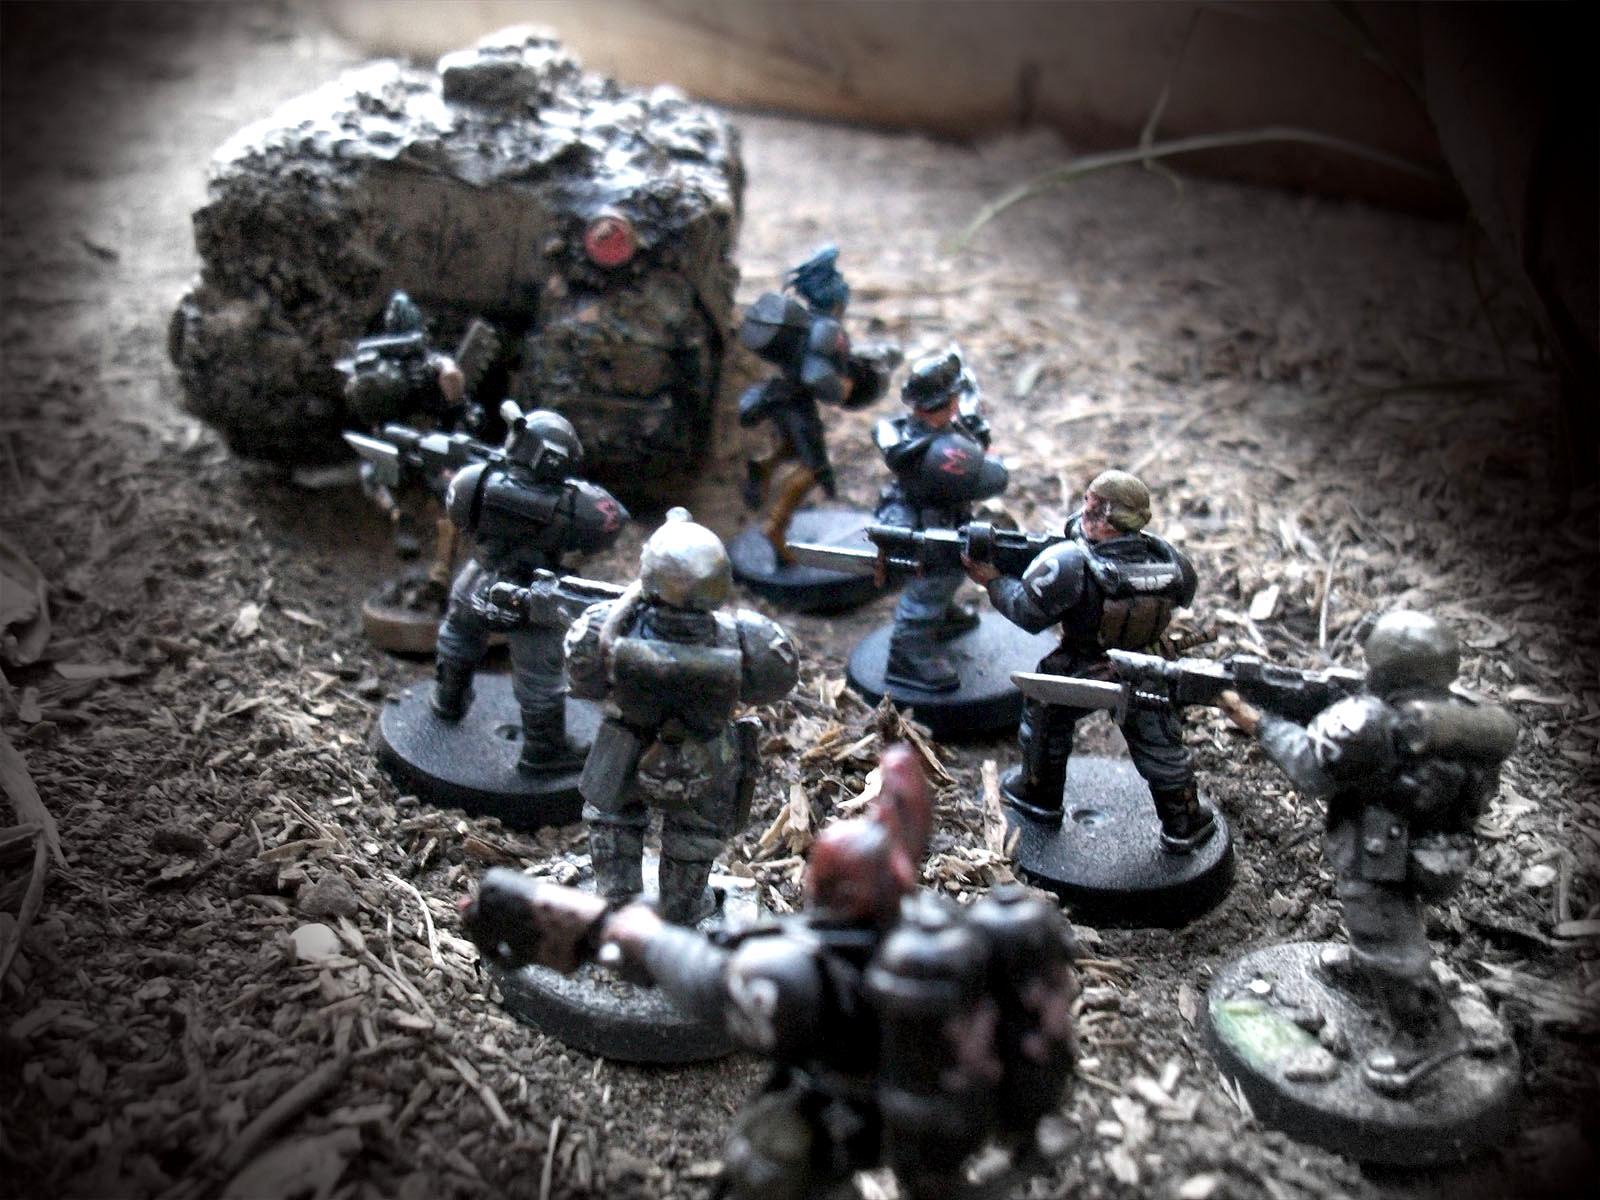 Acid Dogs, Breaching, Conversion, Drill, Guardsmen, Hades, Imperial, Imperial Guard, Mole, Mordant, Raid, Rats, Scratch, Scratch Build, Subterranean, Tunnel War, Underground